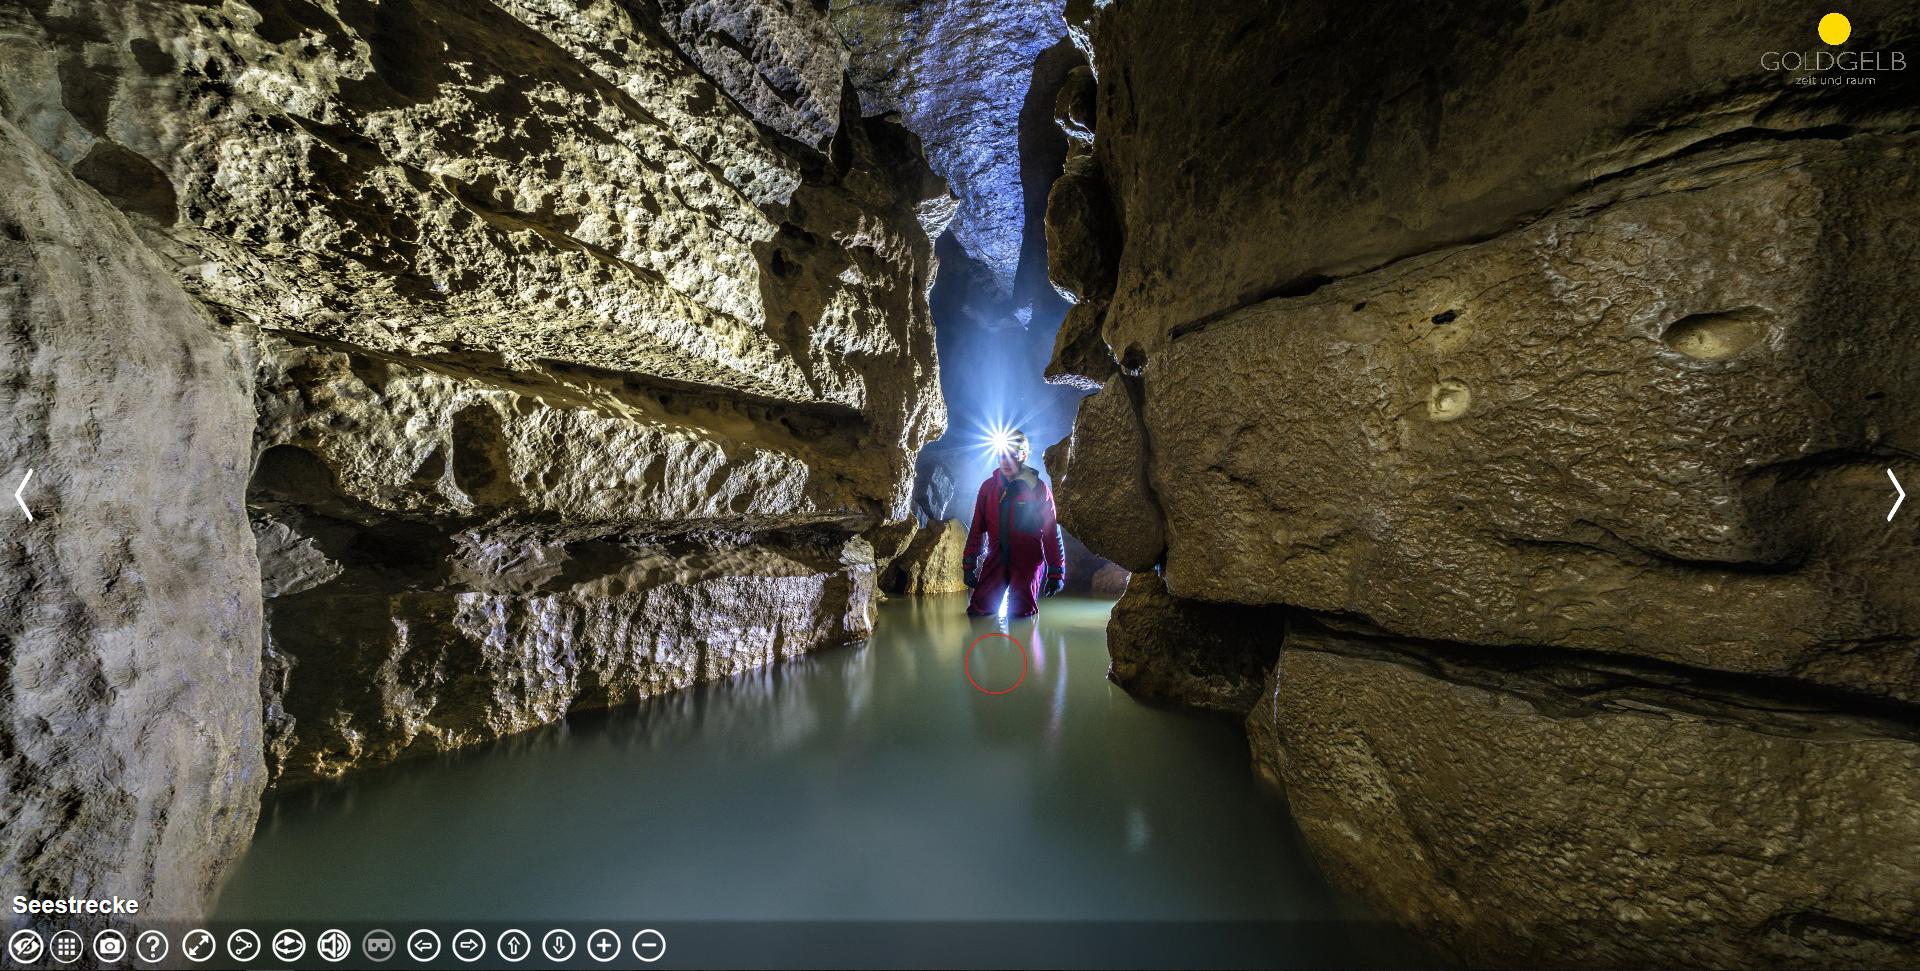 360 Grad Fotografie / Virtual Reality: Tourismus Fotografie: Falkensteinhöhle